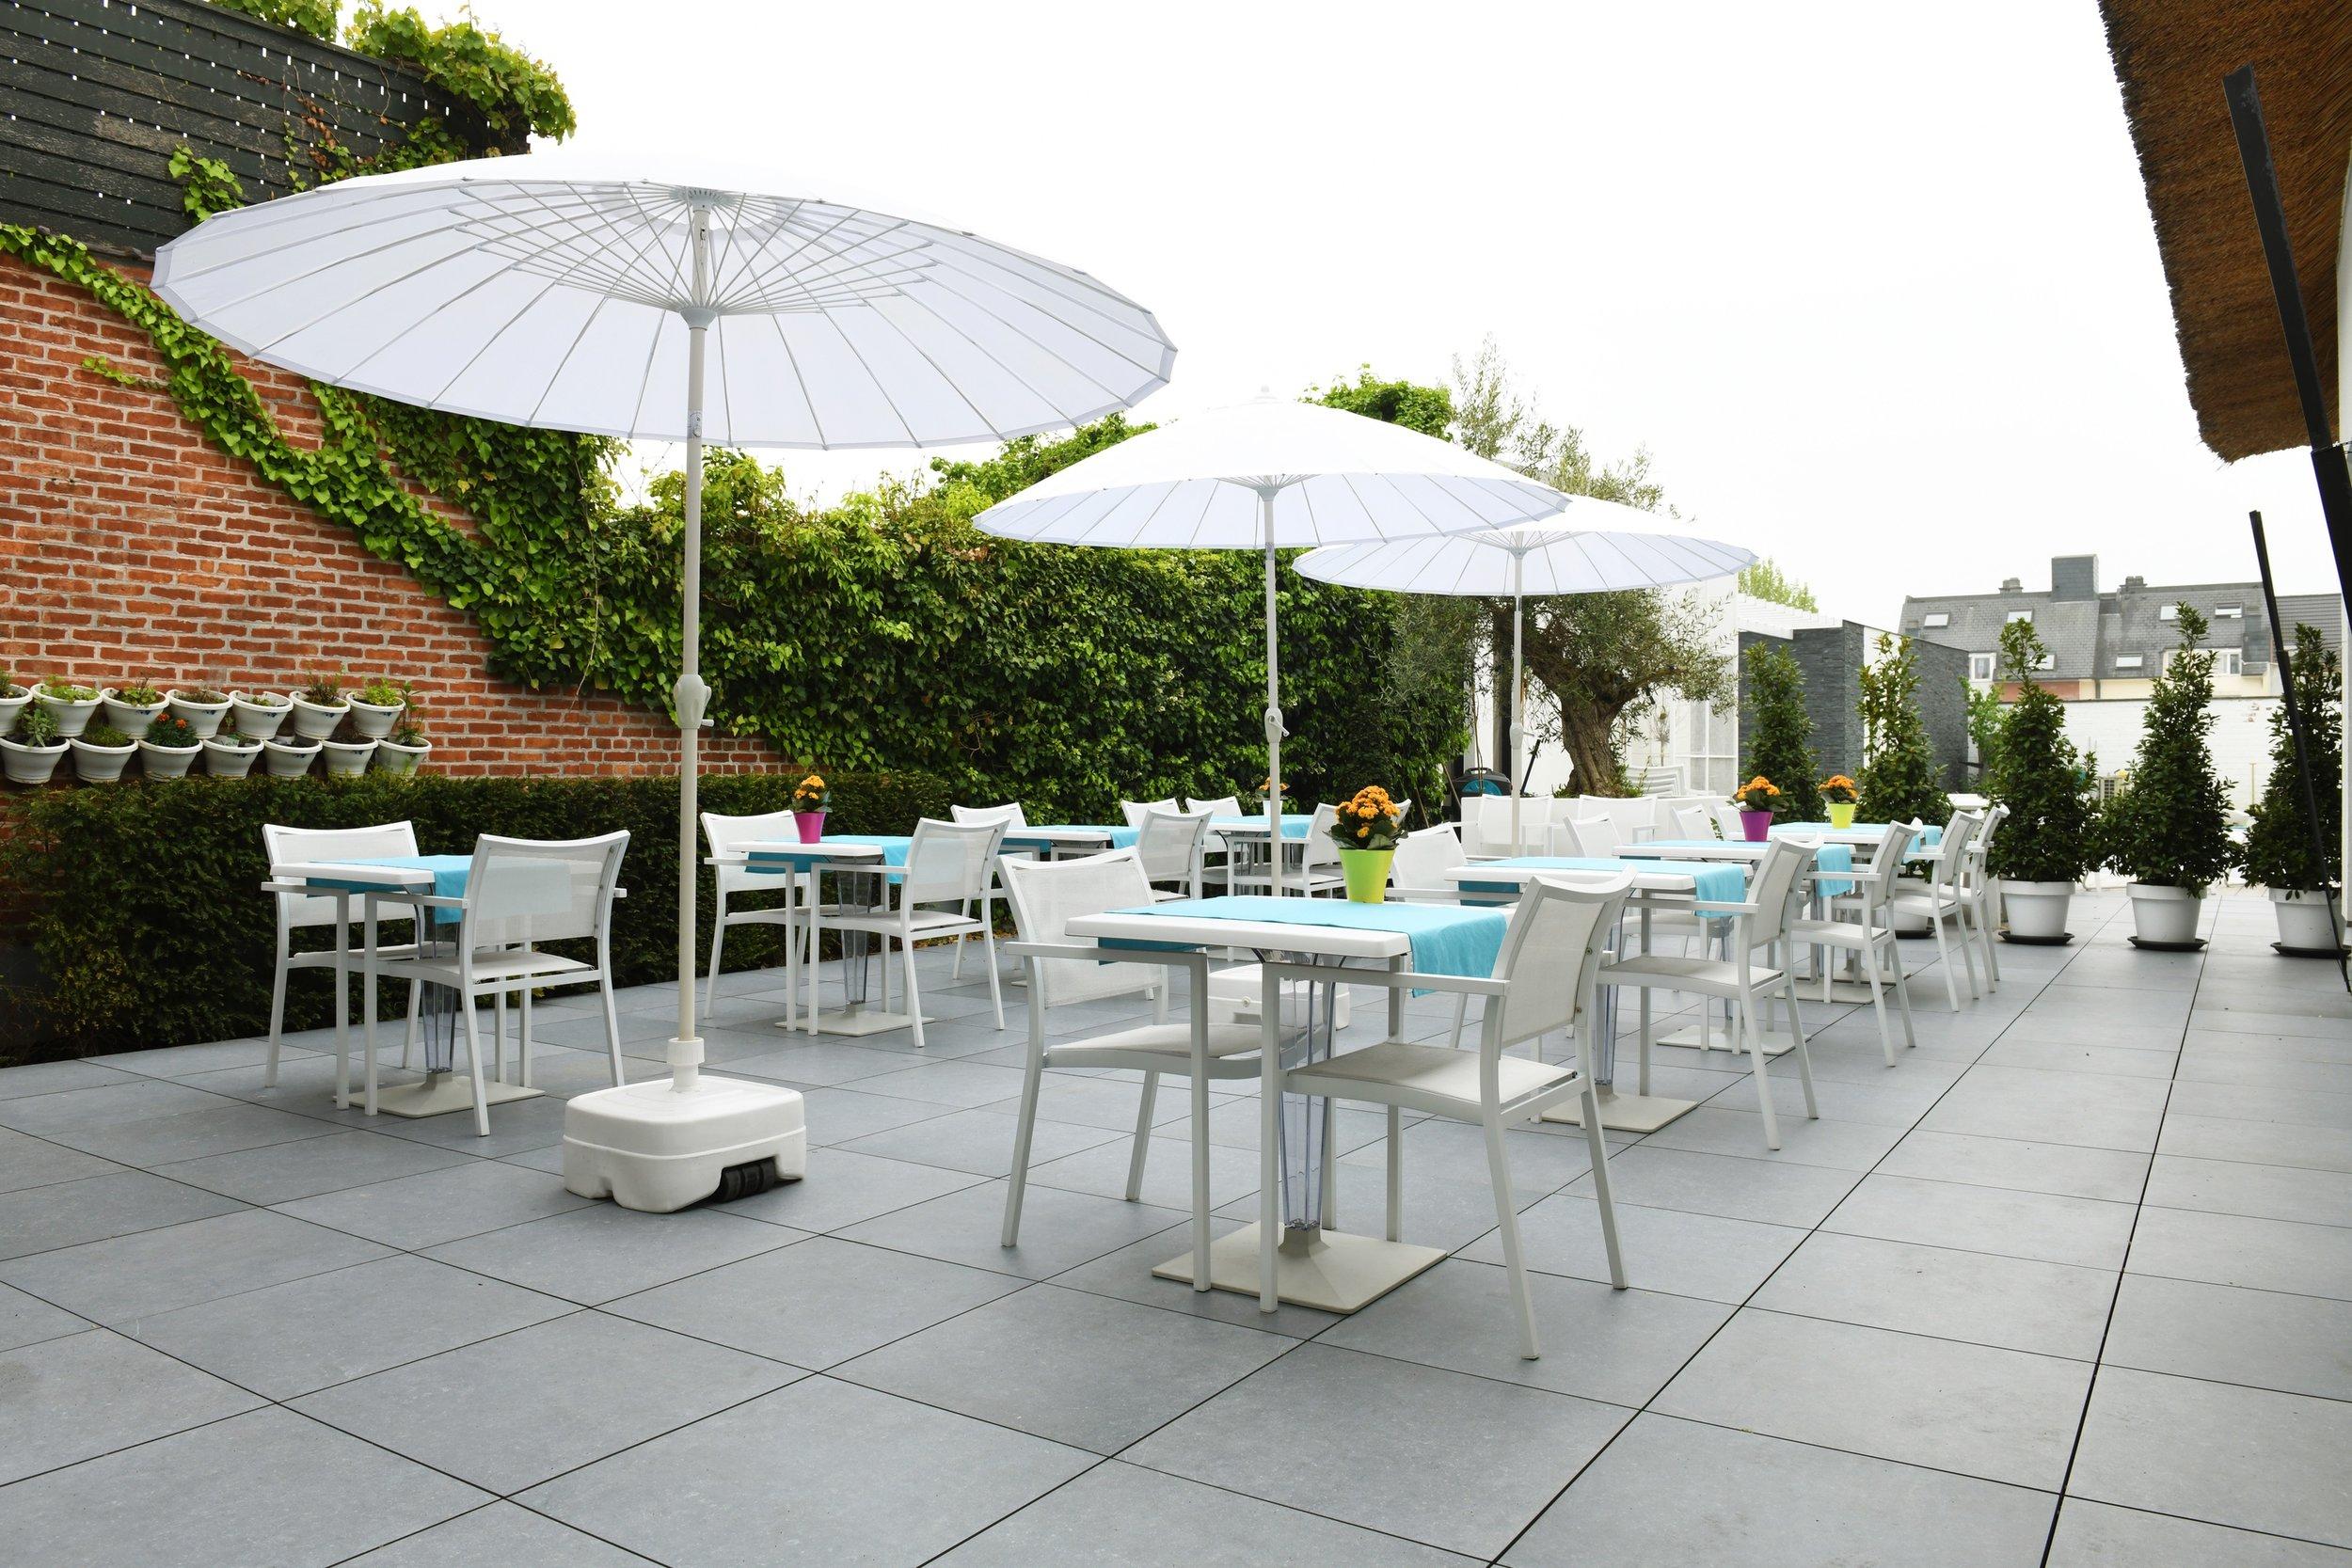 8 restaurant brasserie oud notarishuis ninove bart albrecht tablefever .jpg